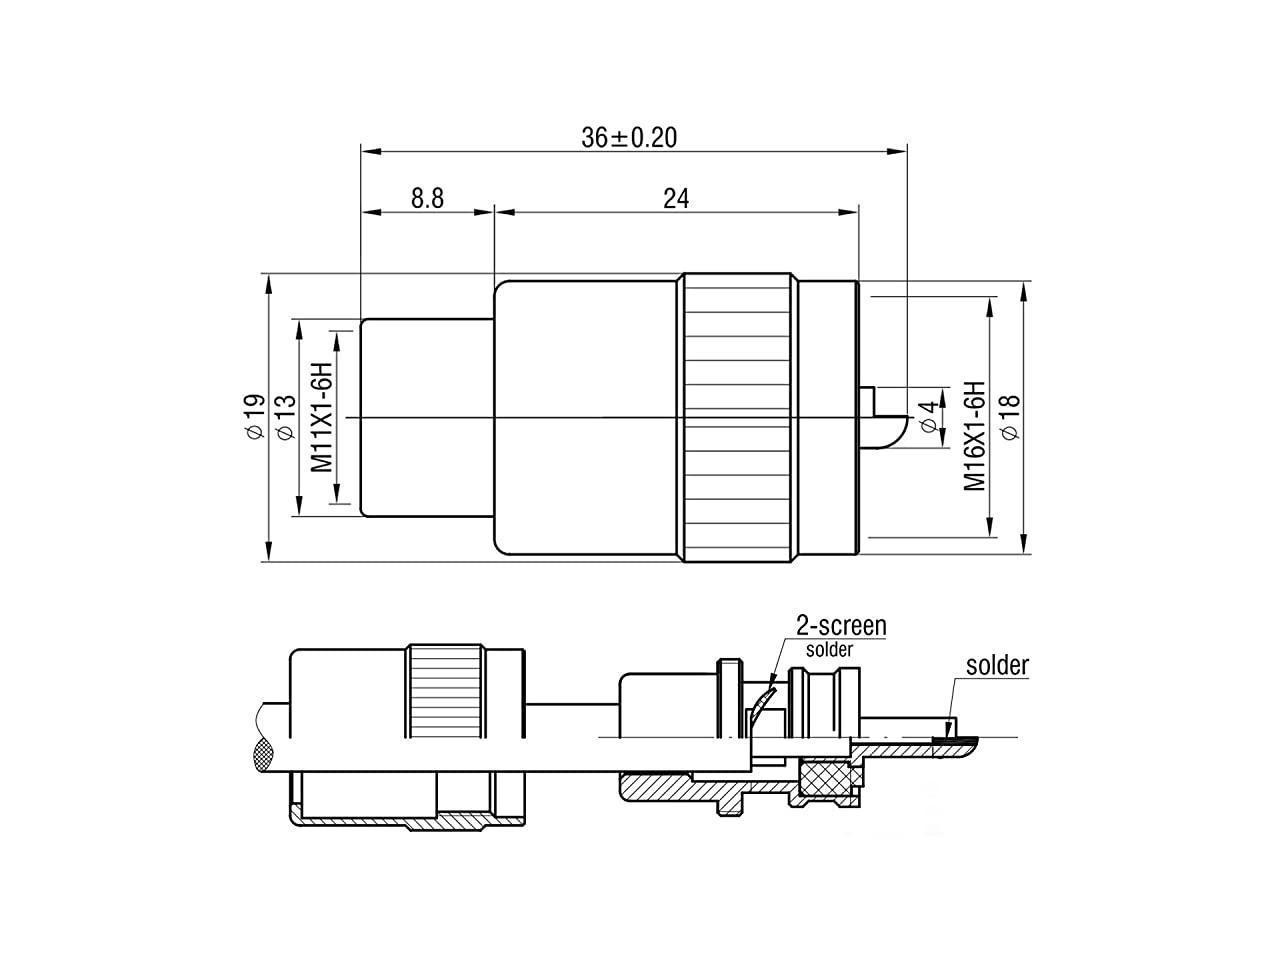 PL259 PL259 MalePlug Solder Coax Connector Adapter RF